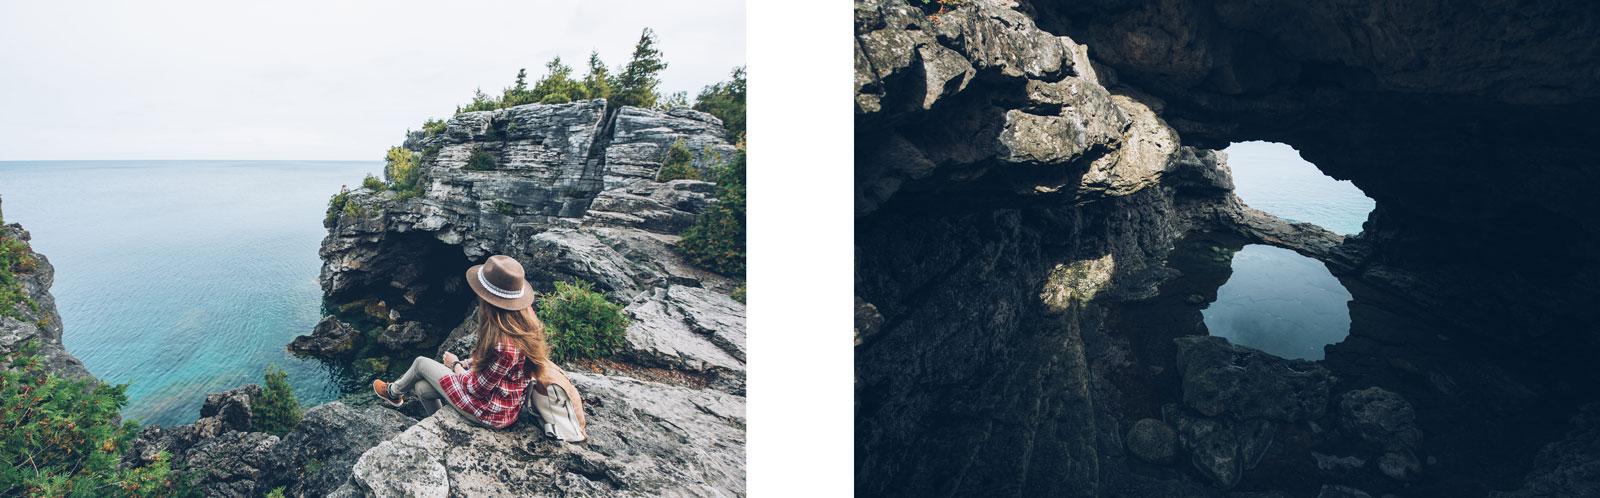 grotto bruce peninsula canada ontario